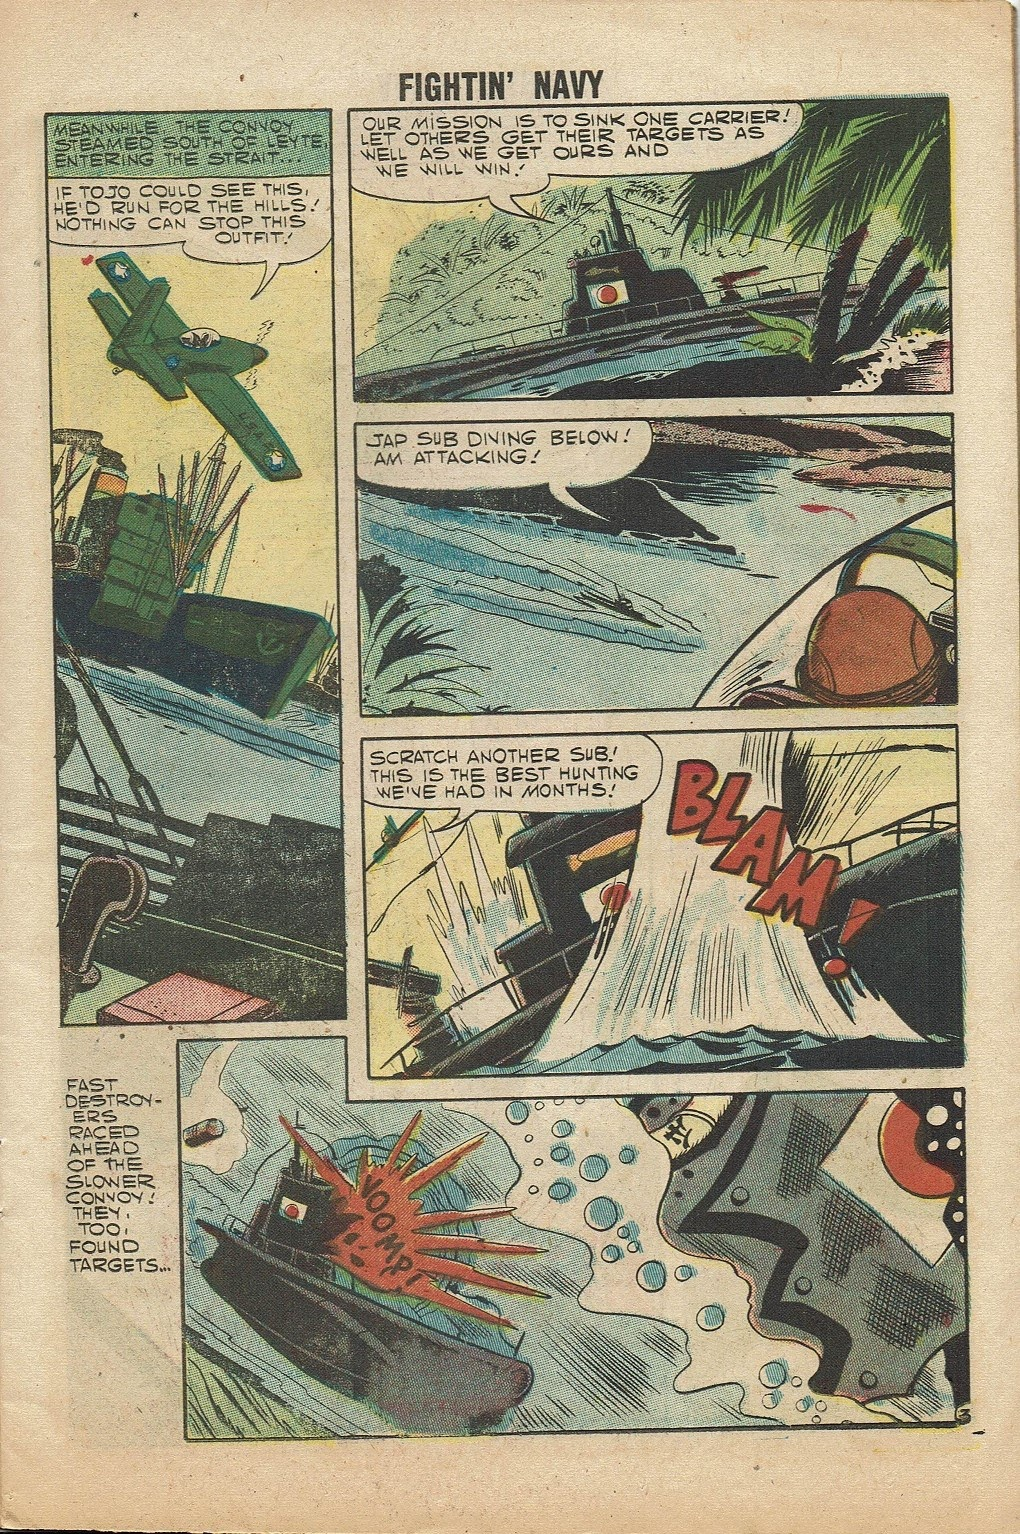 Read online Fightin' Navy comic -  Issue #81 - 11